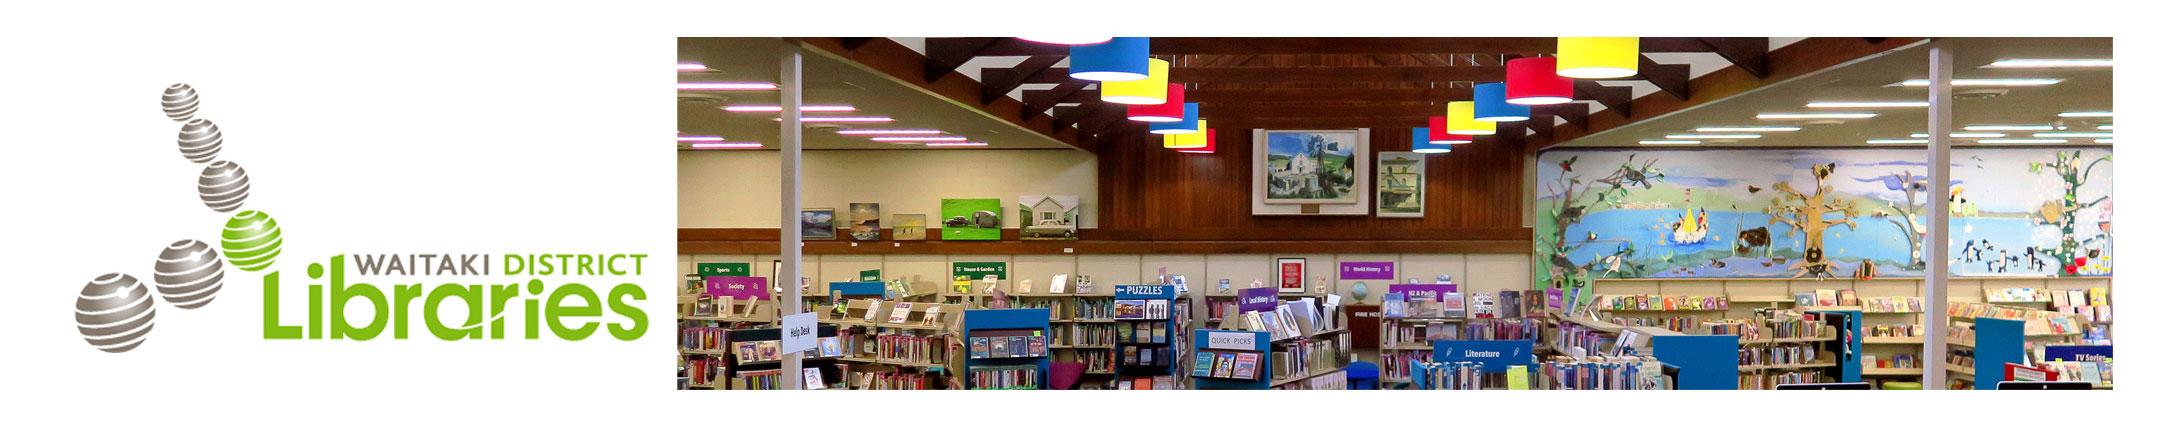 Waitaki District Libraries